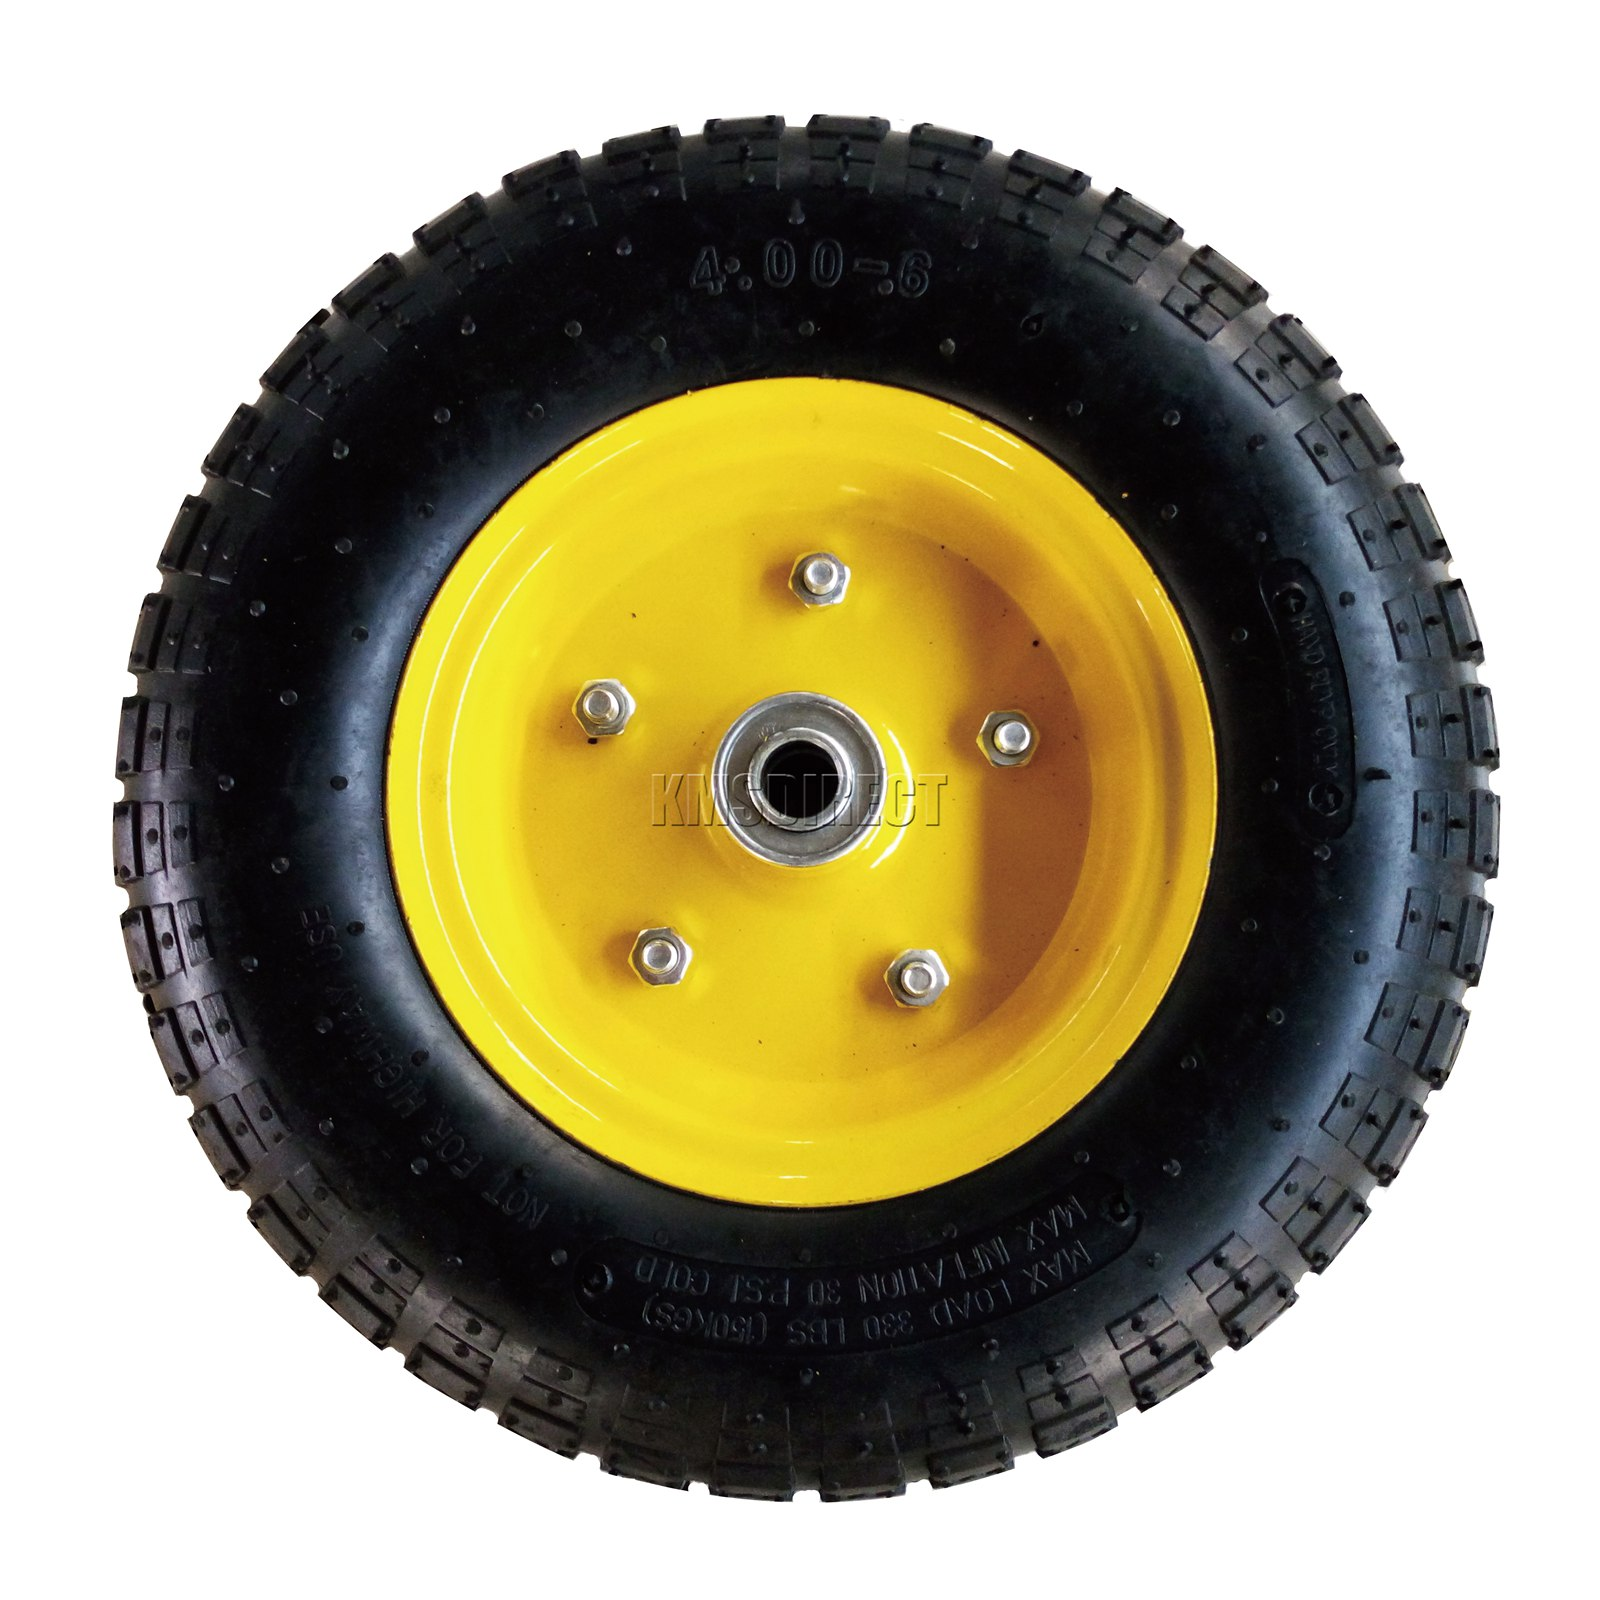 FoxHunter-Heavy-Duty-Garden-Dump-Truck-Tipping-Trailer-Trolley-Cart-Wheelbarrow miniatuur 27